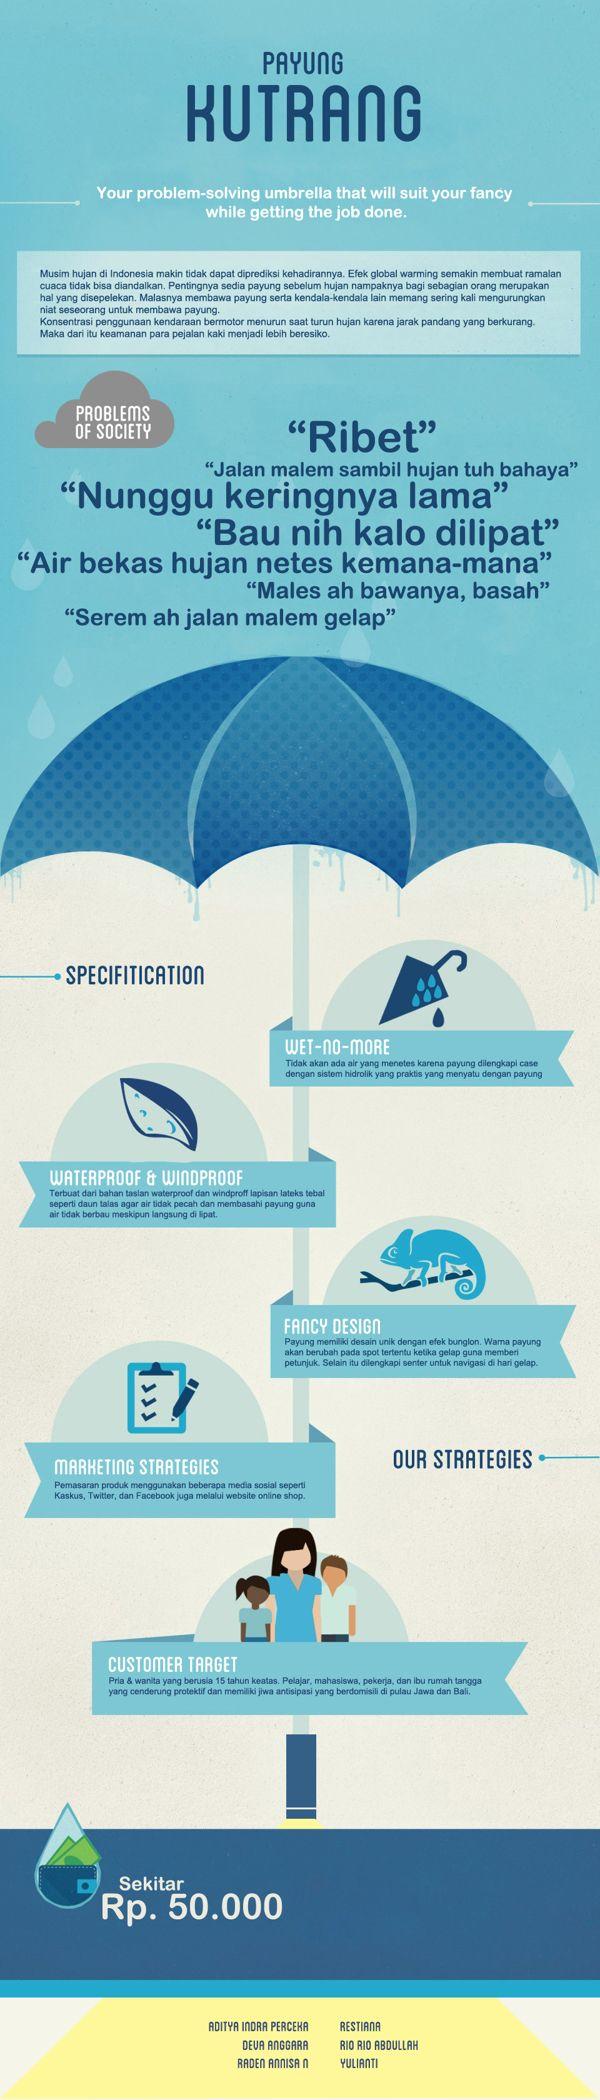 [Infographic] Payung Kutrang by Deva Anggara, via Behance